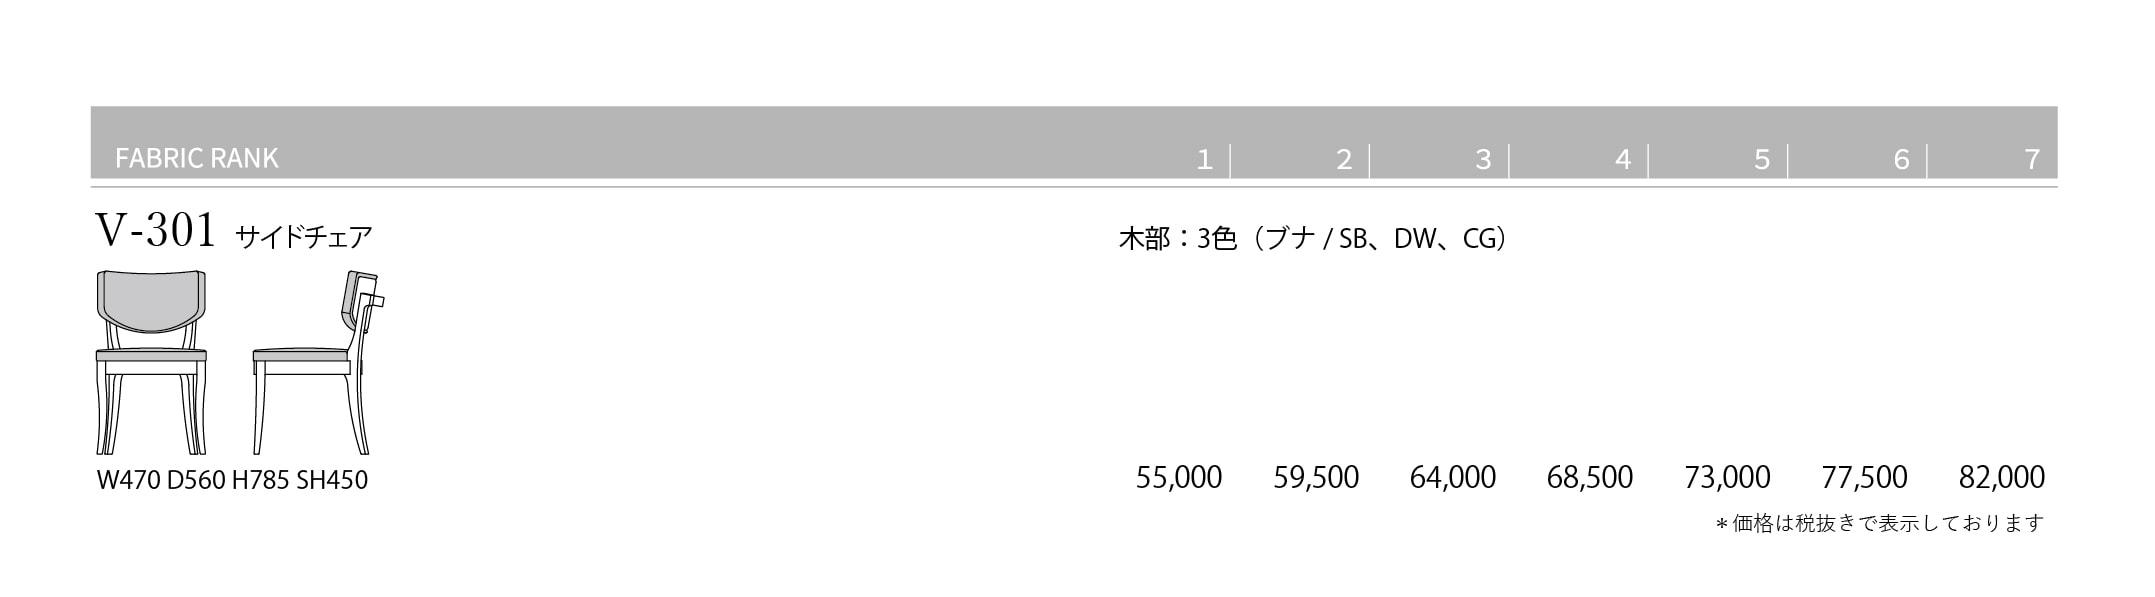 V-301 Price List